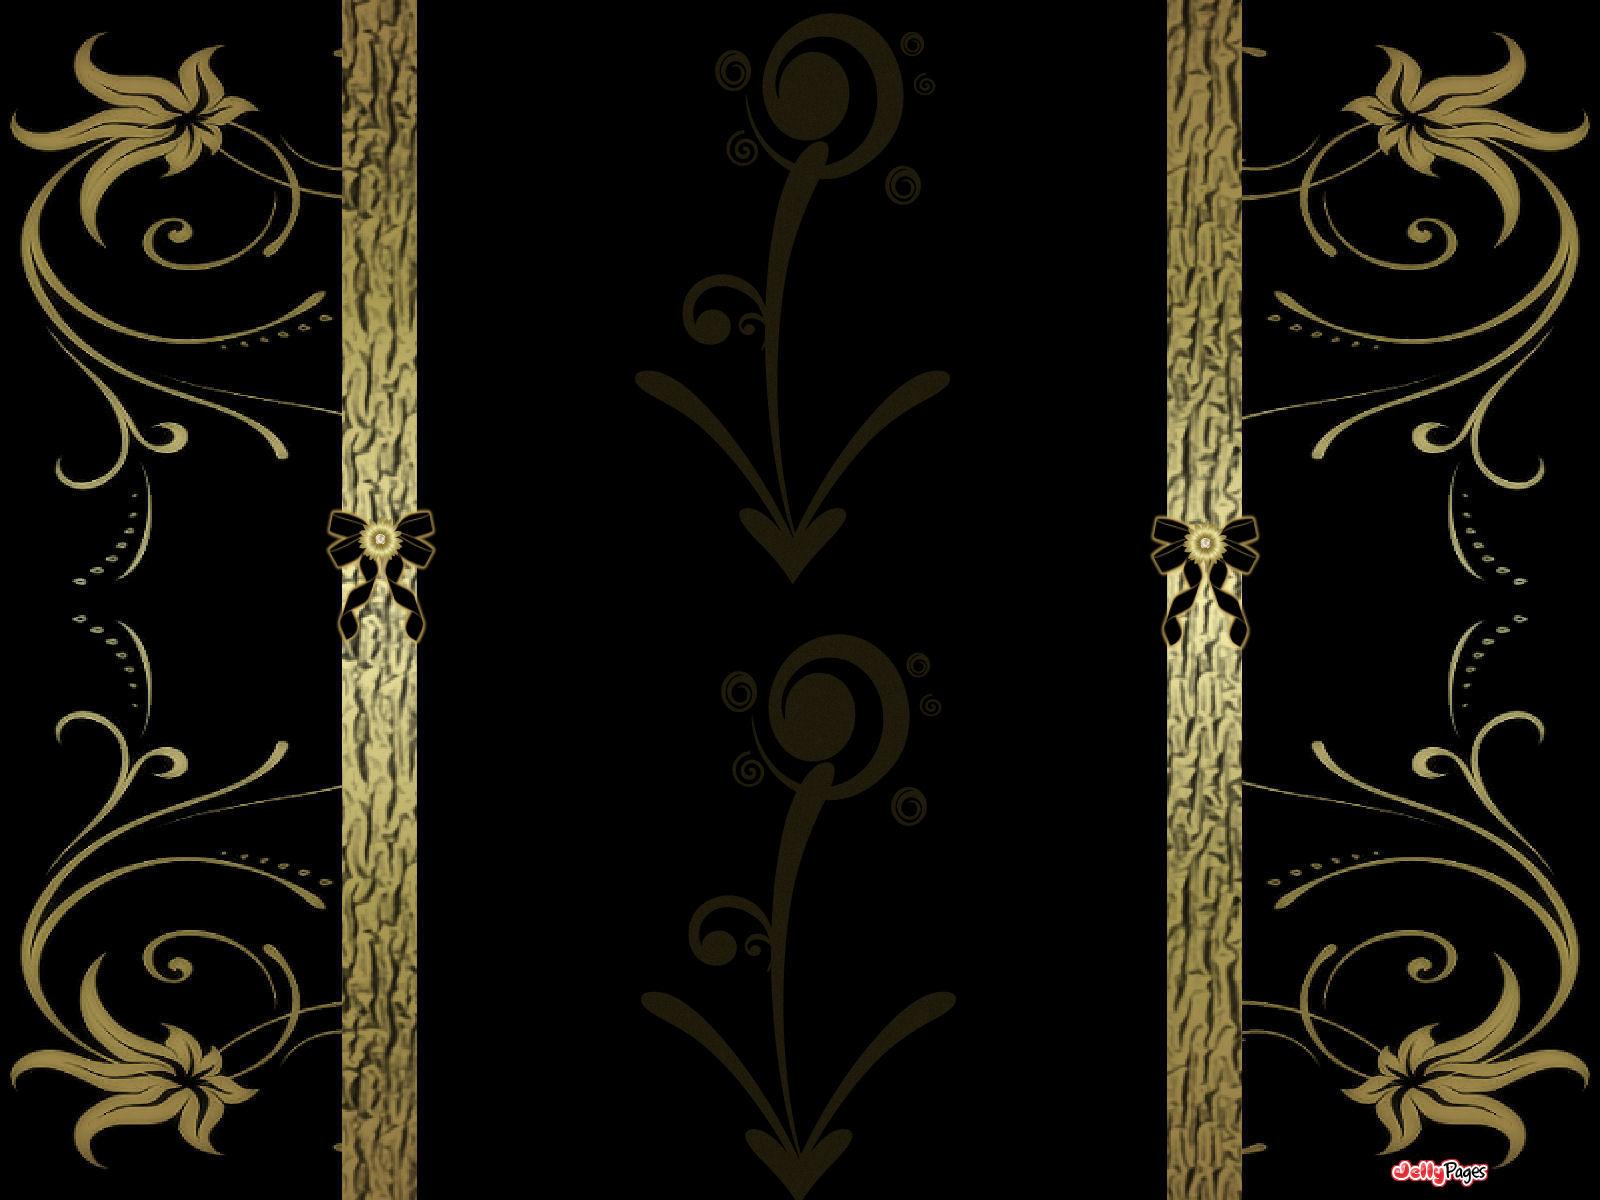 Free Download Elegant Gold And Black Wallpaper 1600x1200